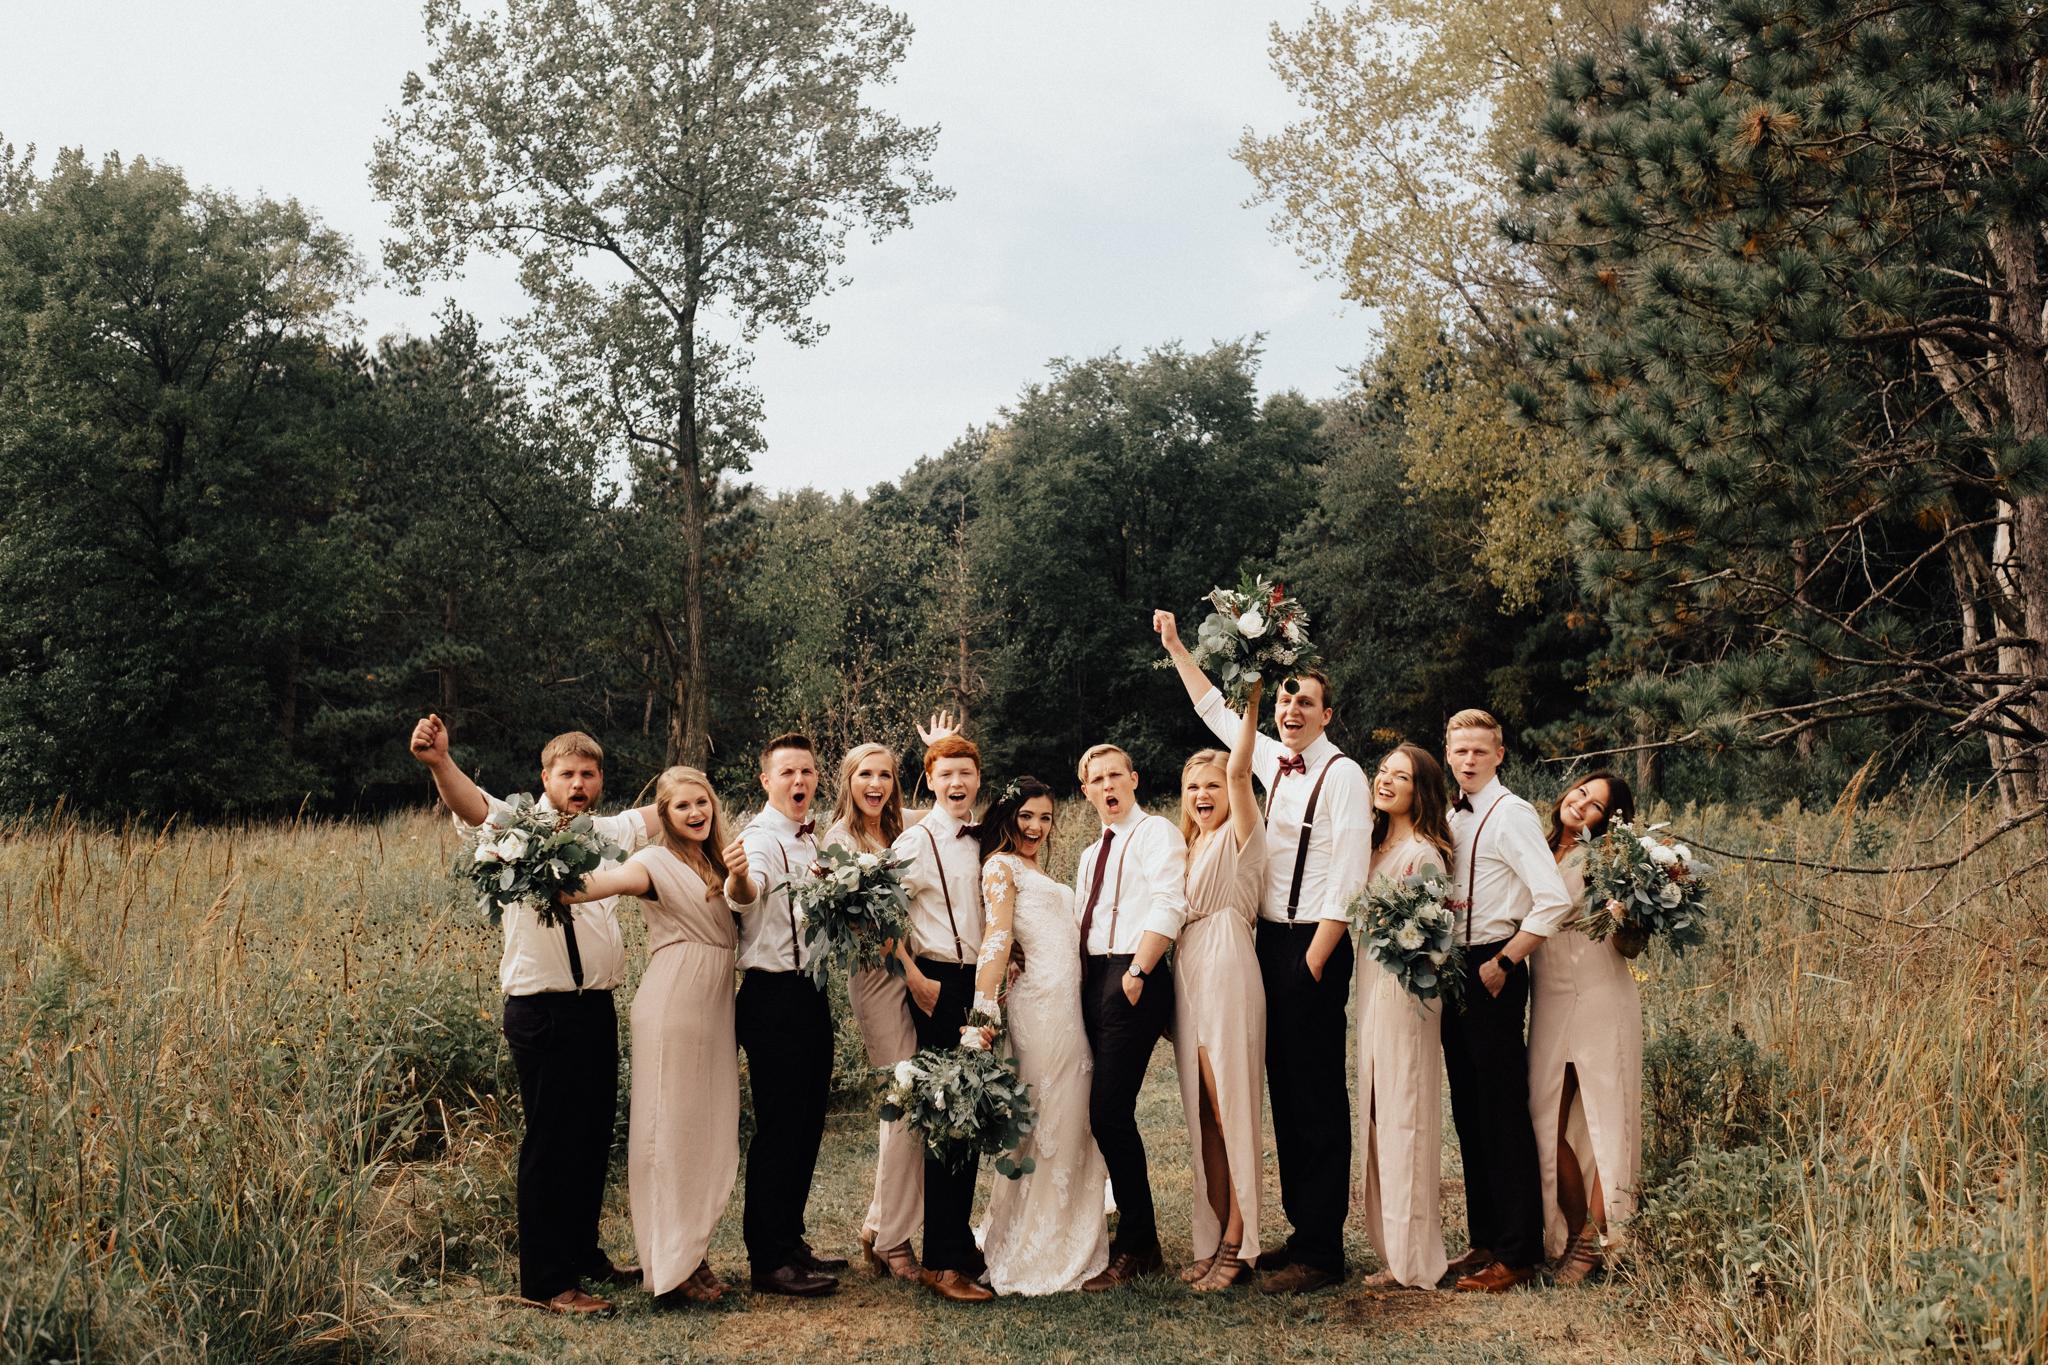 Arizona-Adventure-Elopement-Wedding-Photographer-157.jpg